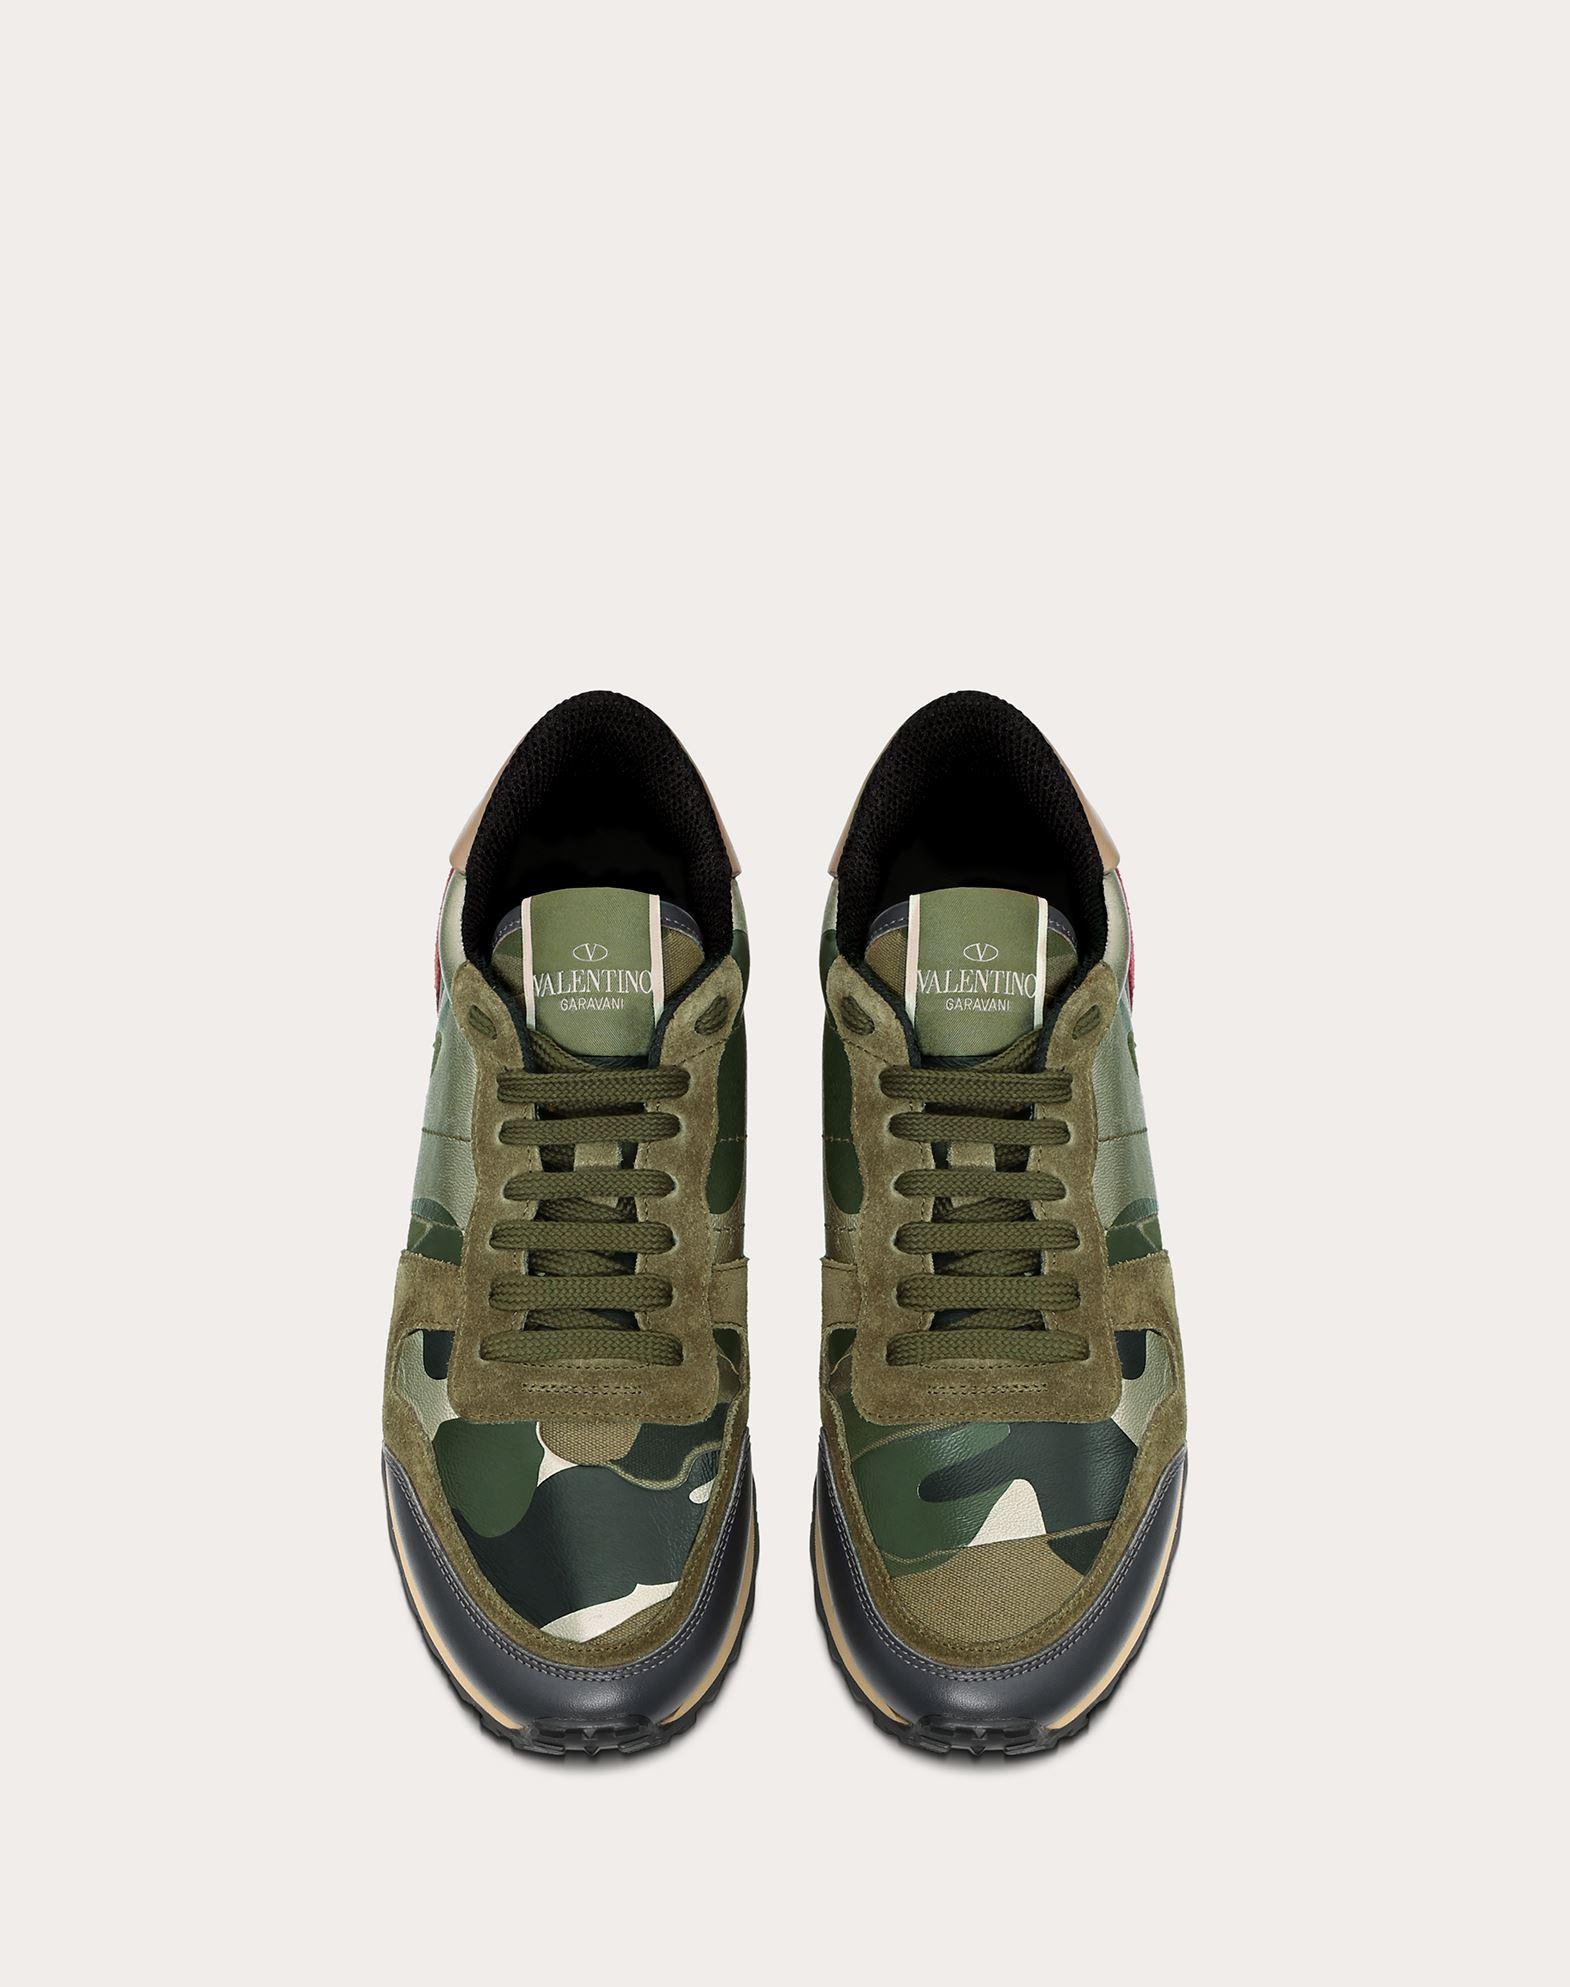 VALENTINO GARAVANI JW2S0291TNL P52 Sneaker D e